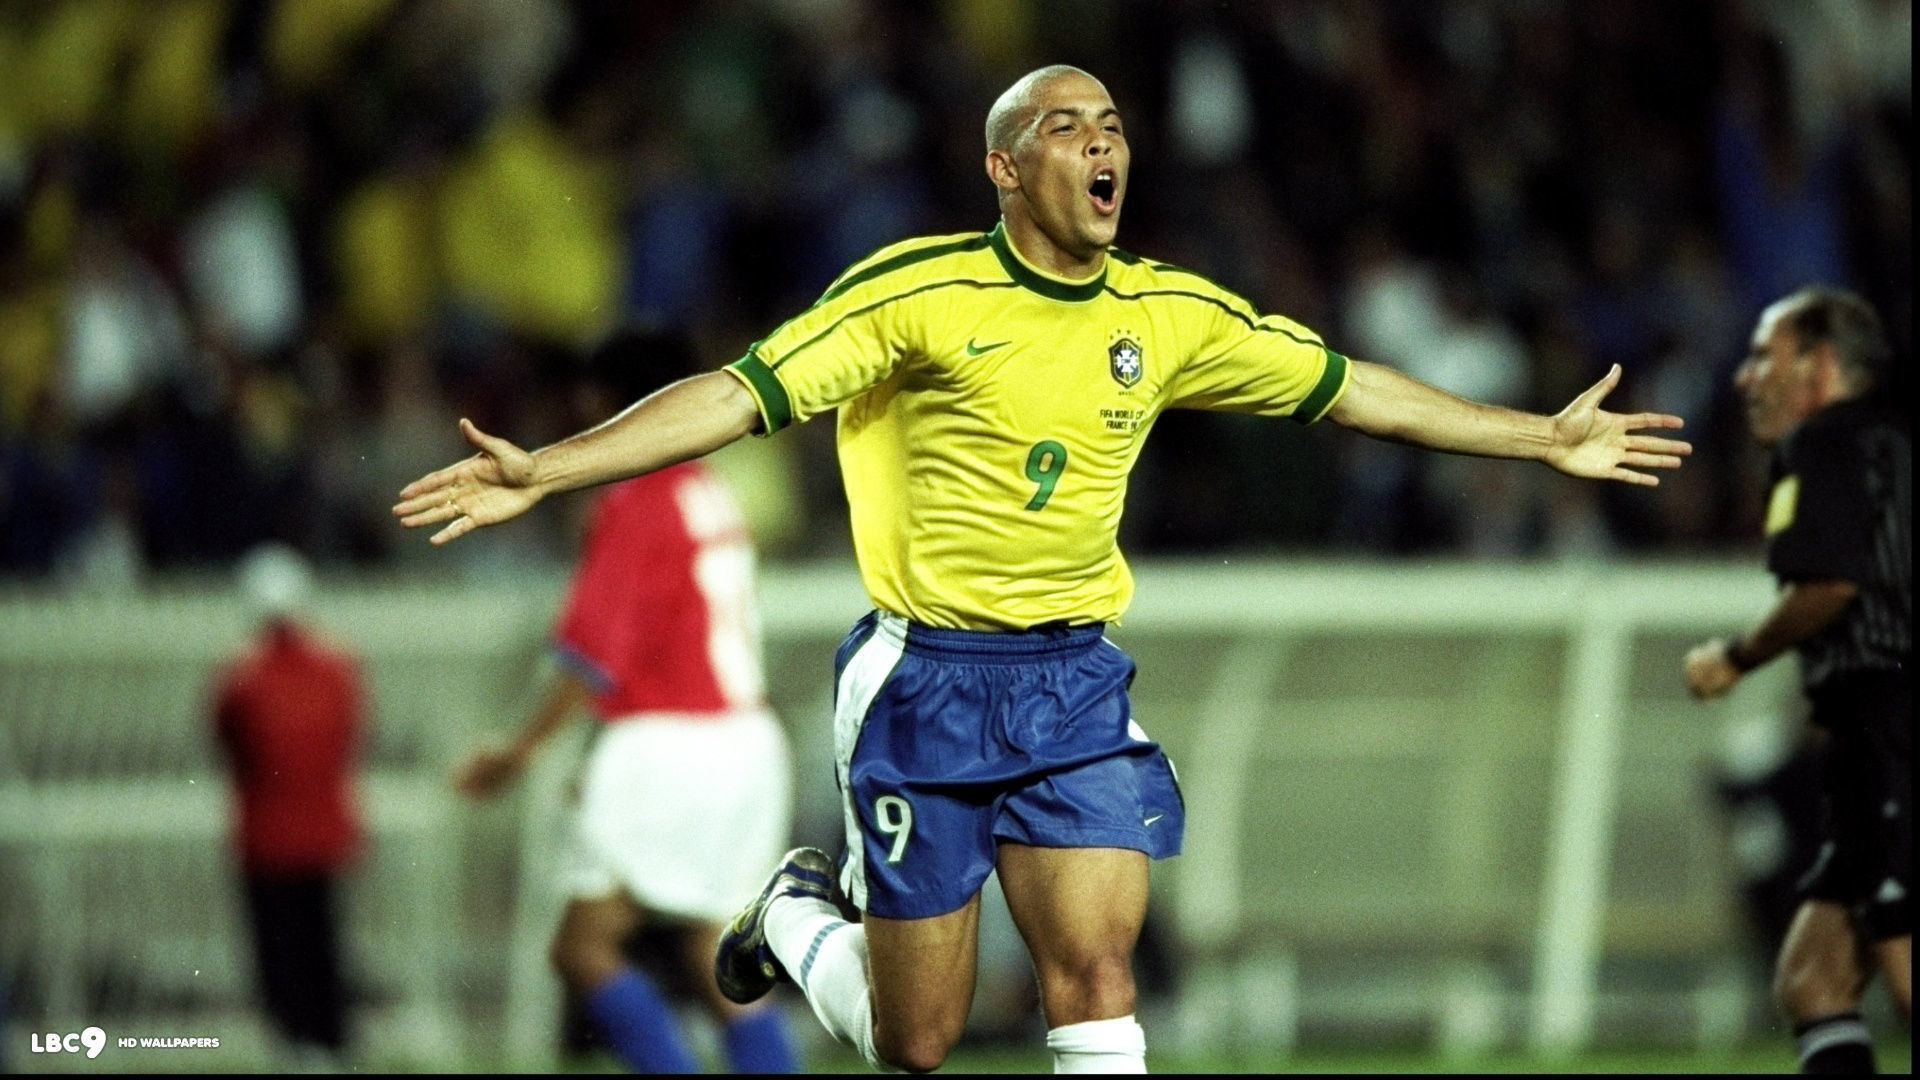 1998-ronaldo.jpg